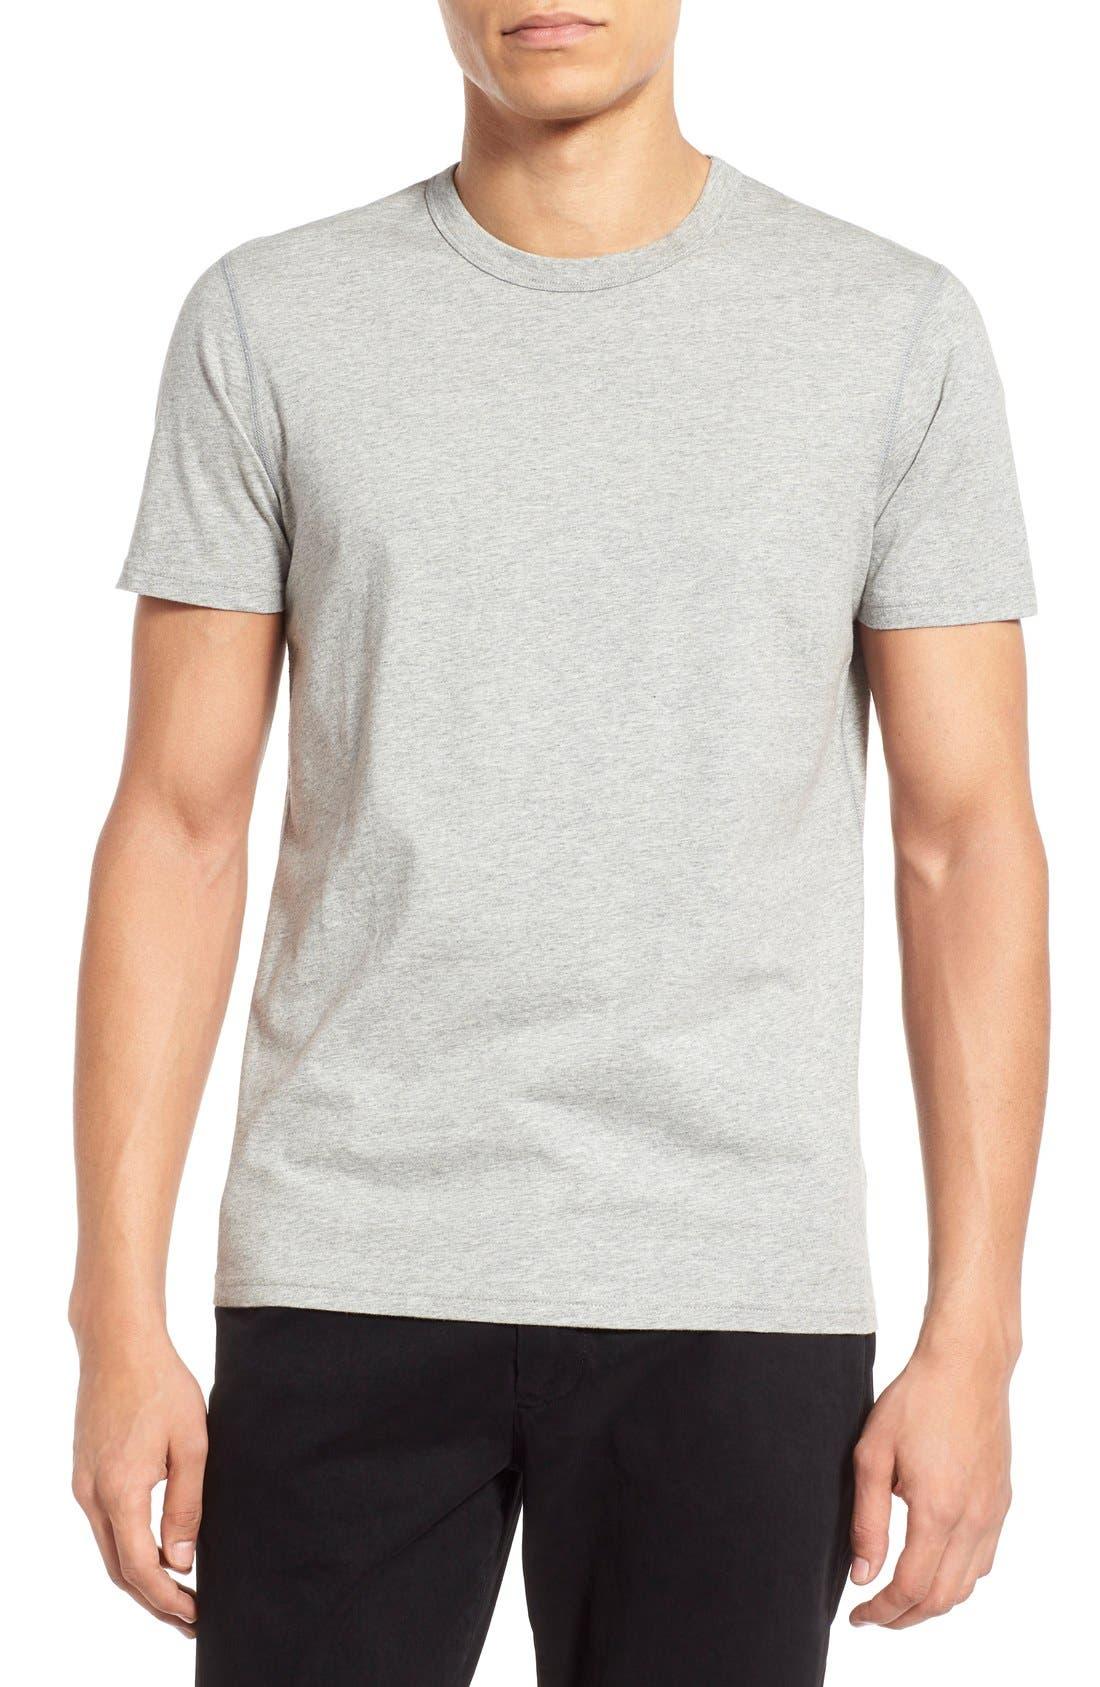 Main Image - Reigning Champ Short Sleeve Crewneck T-Shirt